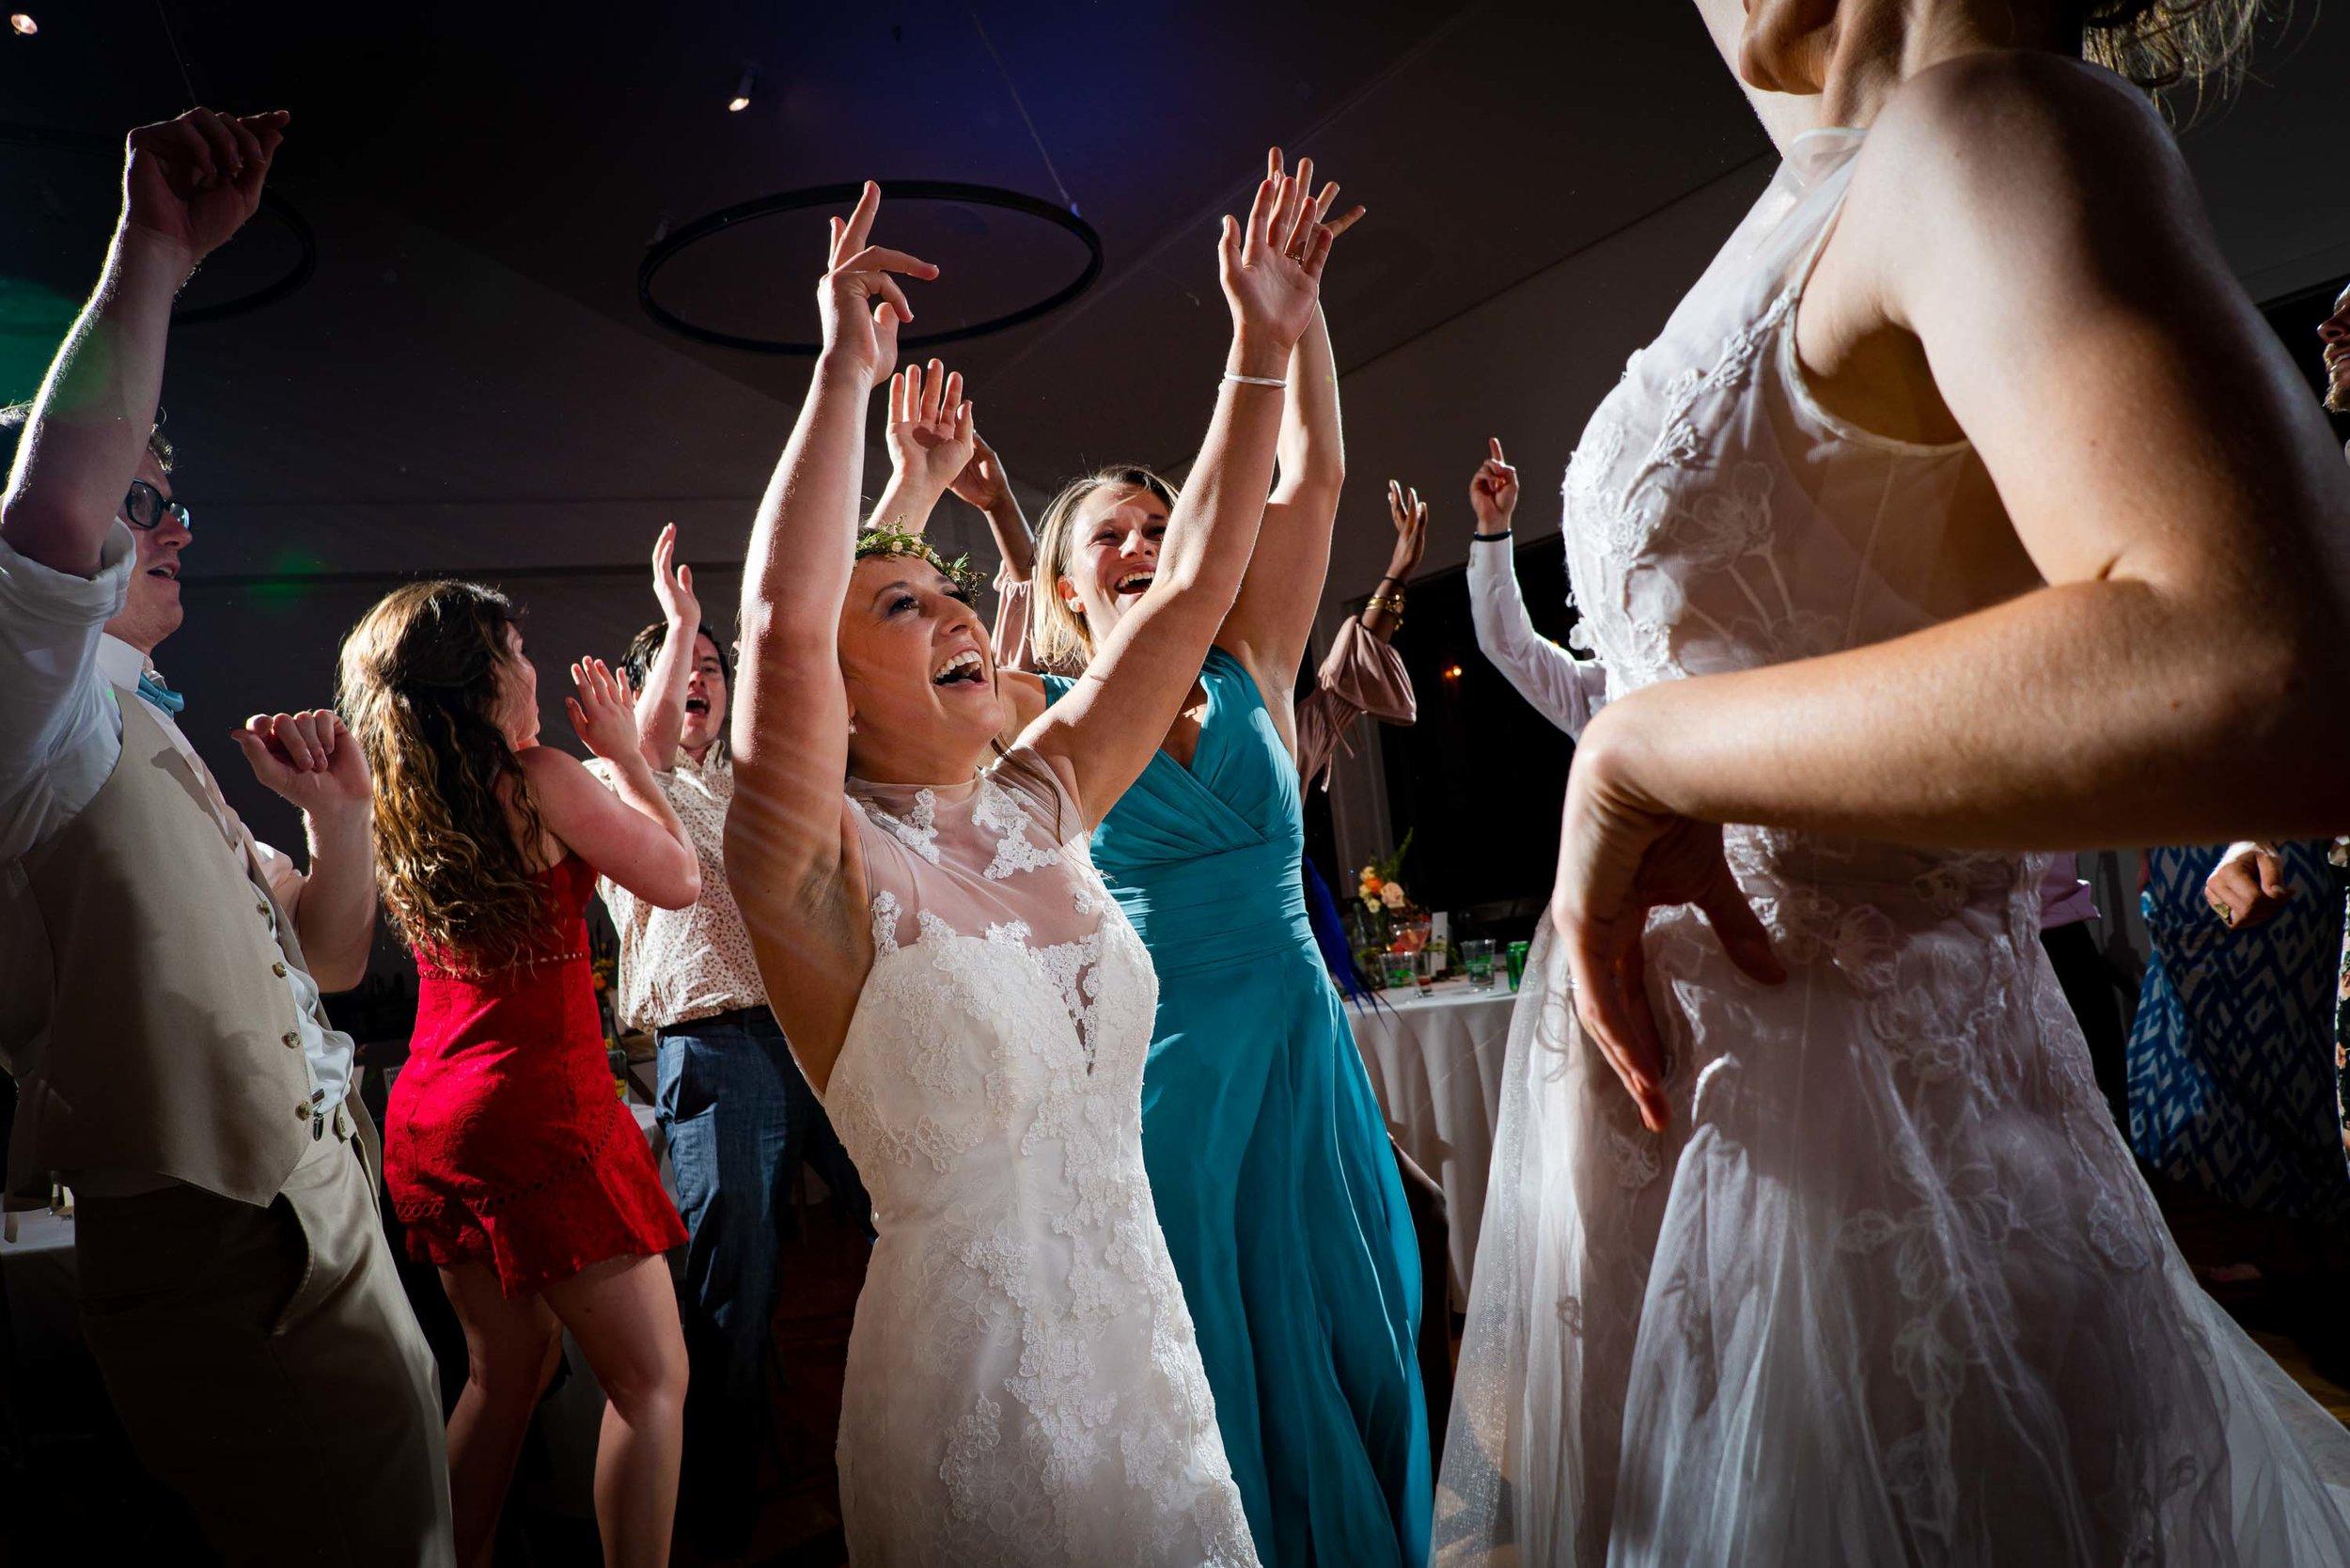 Rist_Canyon_Inn_Laporte_Wedding-216.jpg